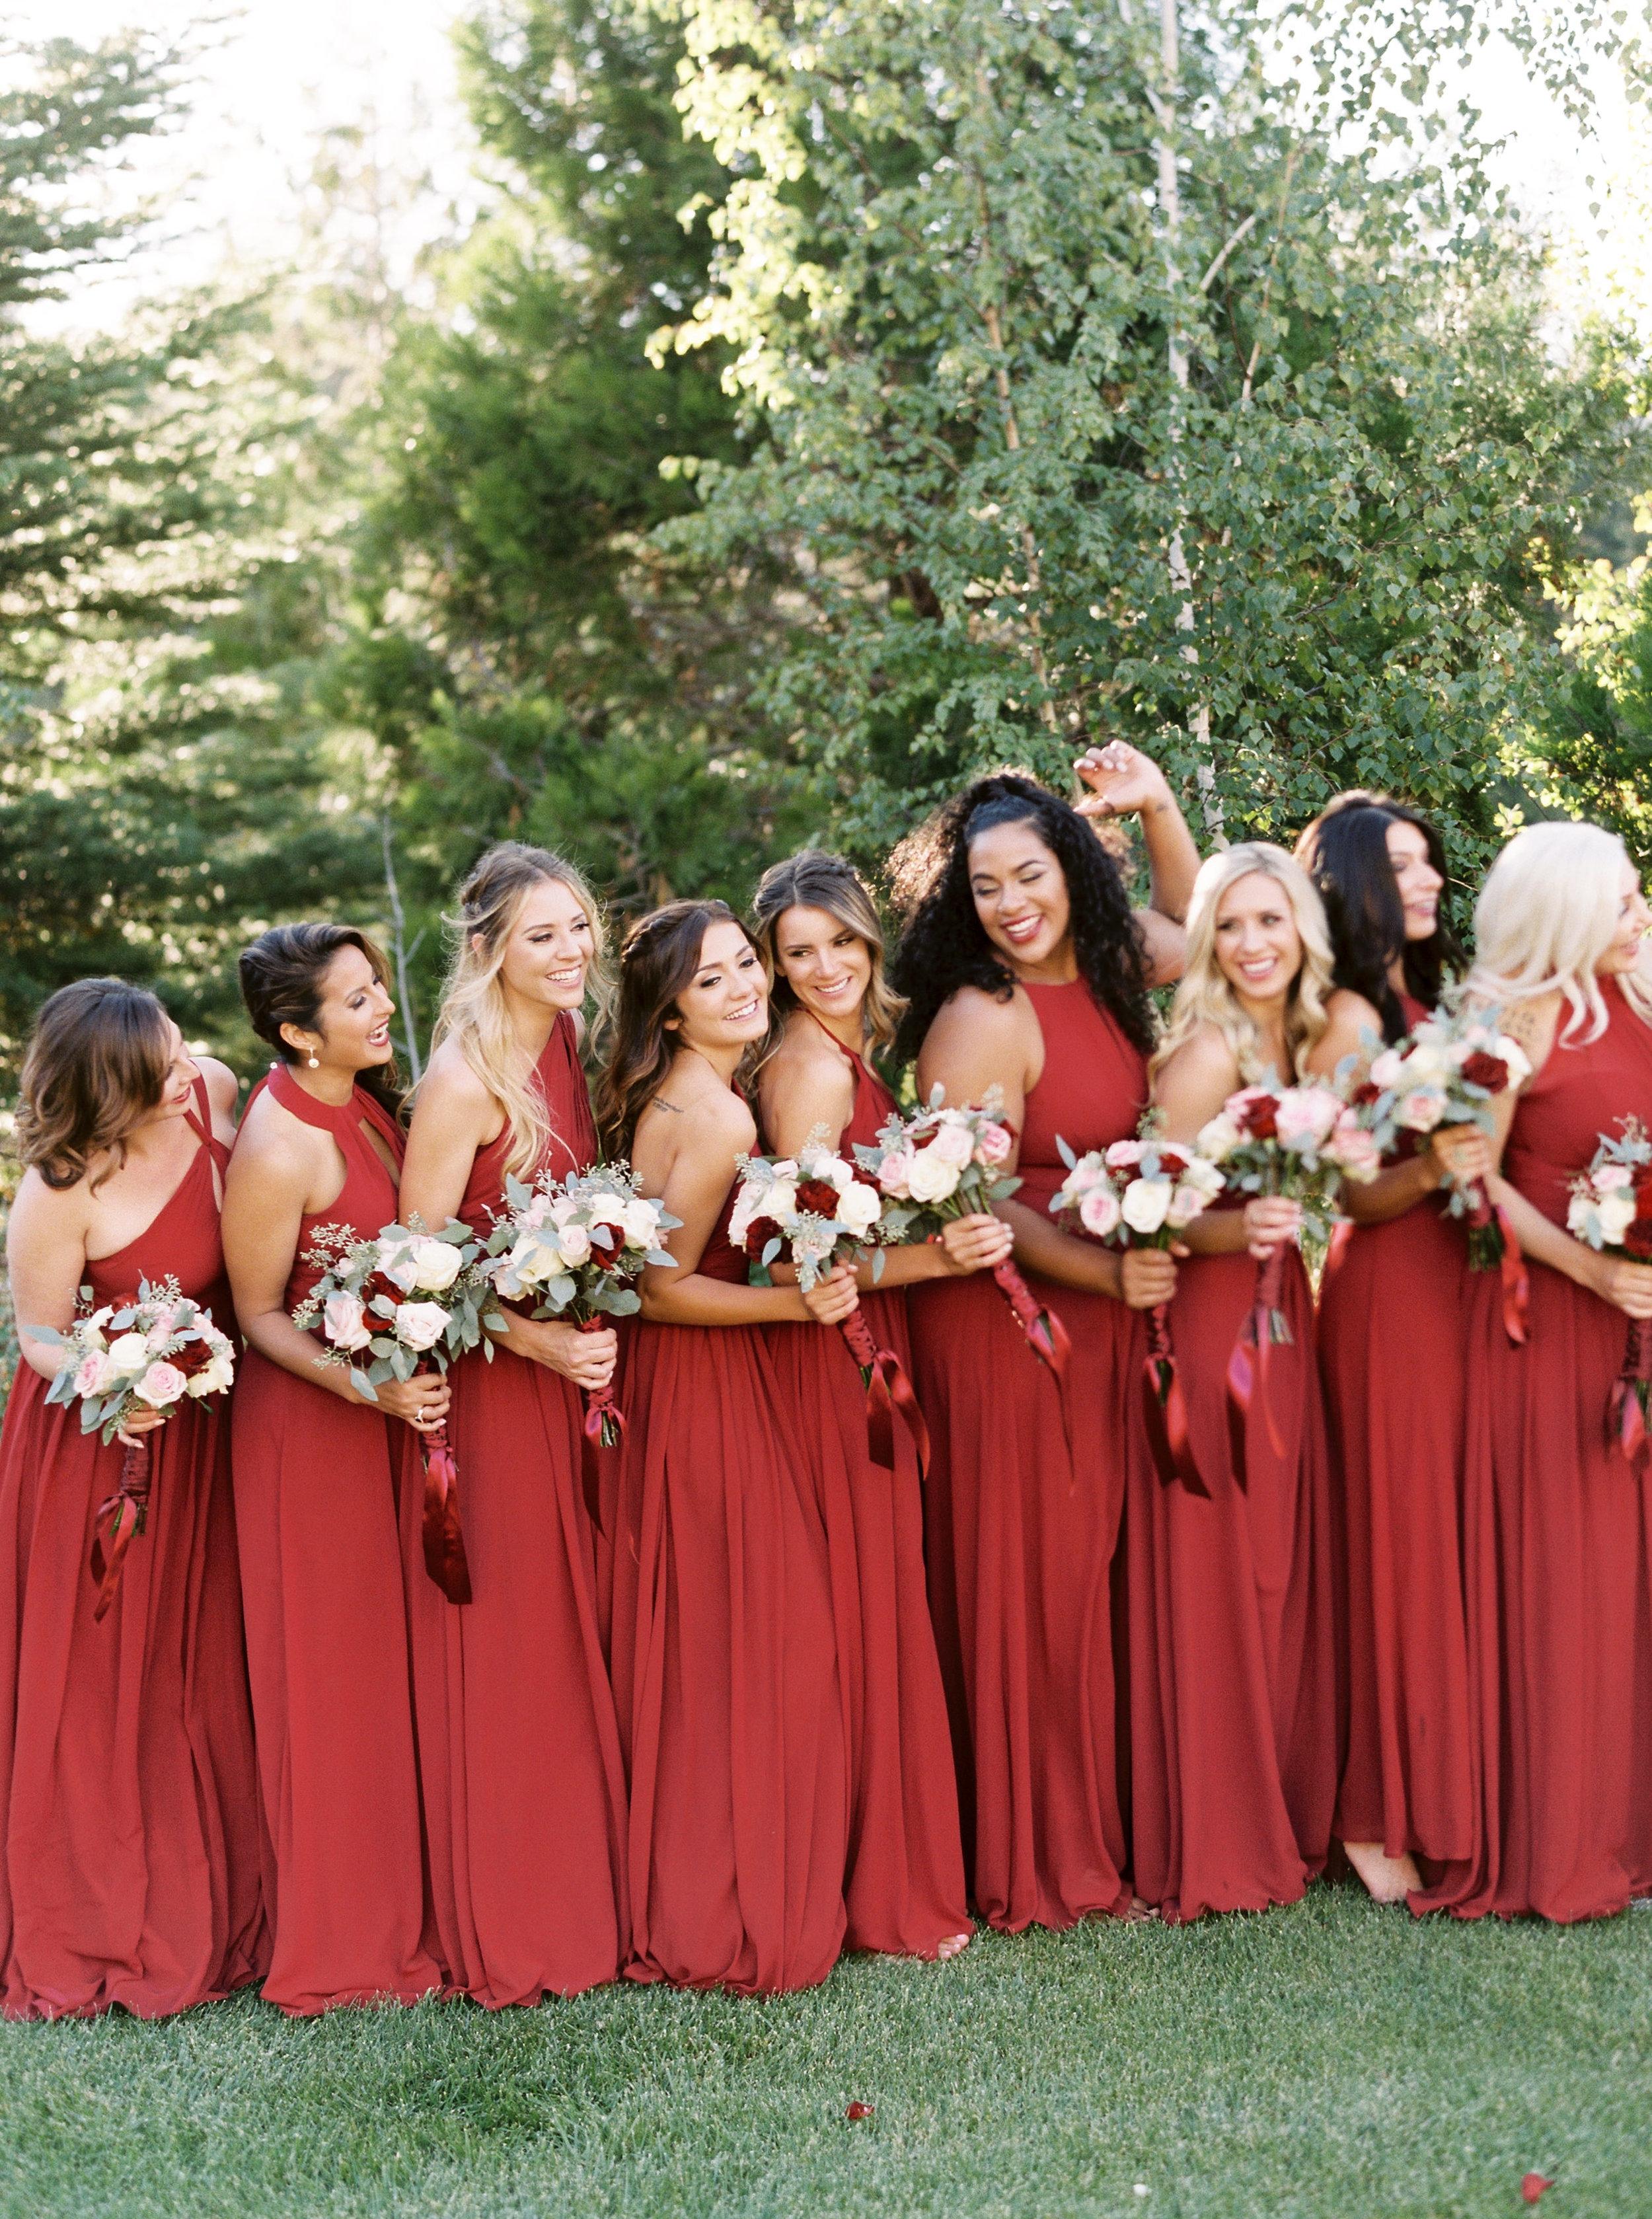 Tenaya-lodge-wedding-at-yosemite-national-park-california-87.jpg